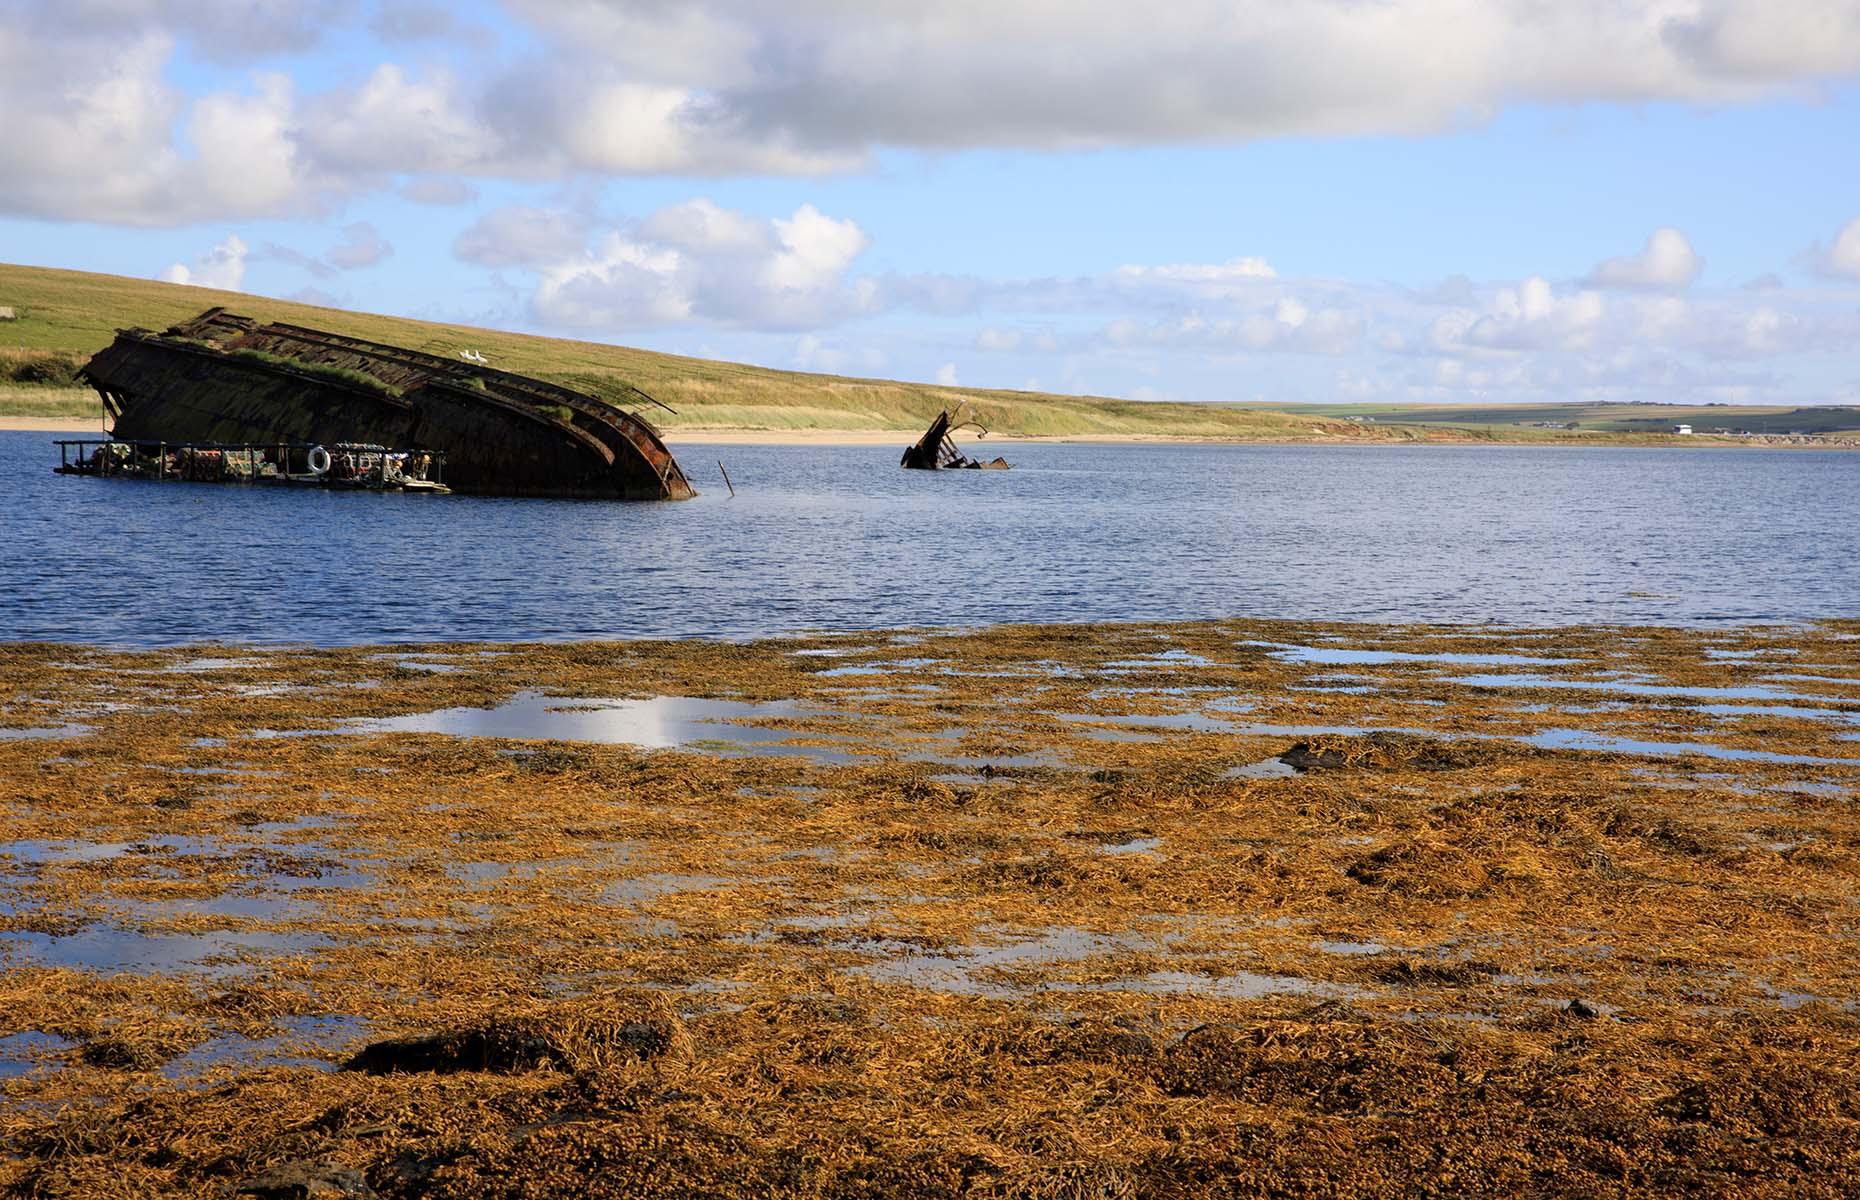 Scapa Flow in Scotland (Image: Paolo Trovo/Shutterstock)